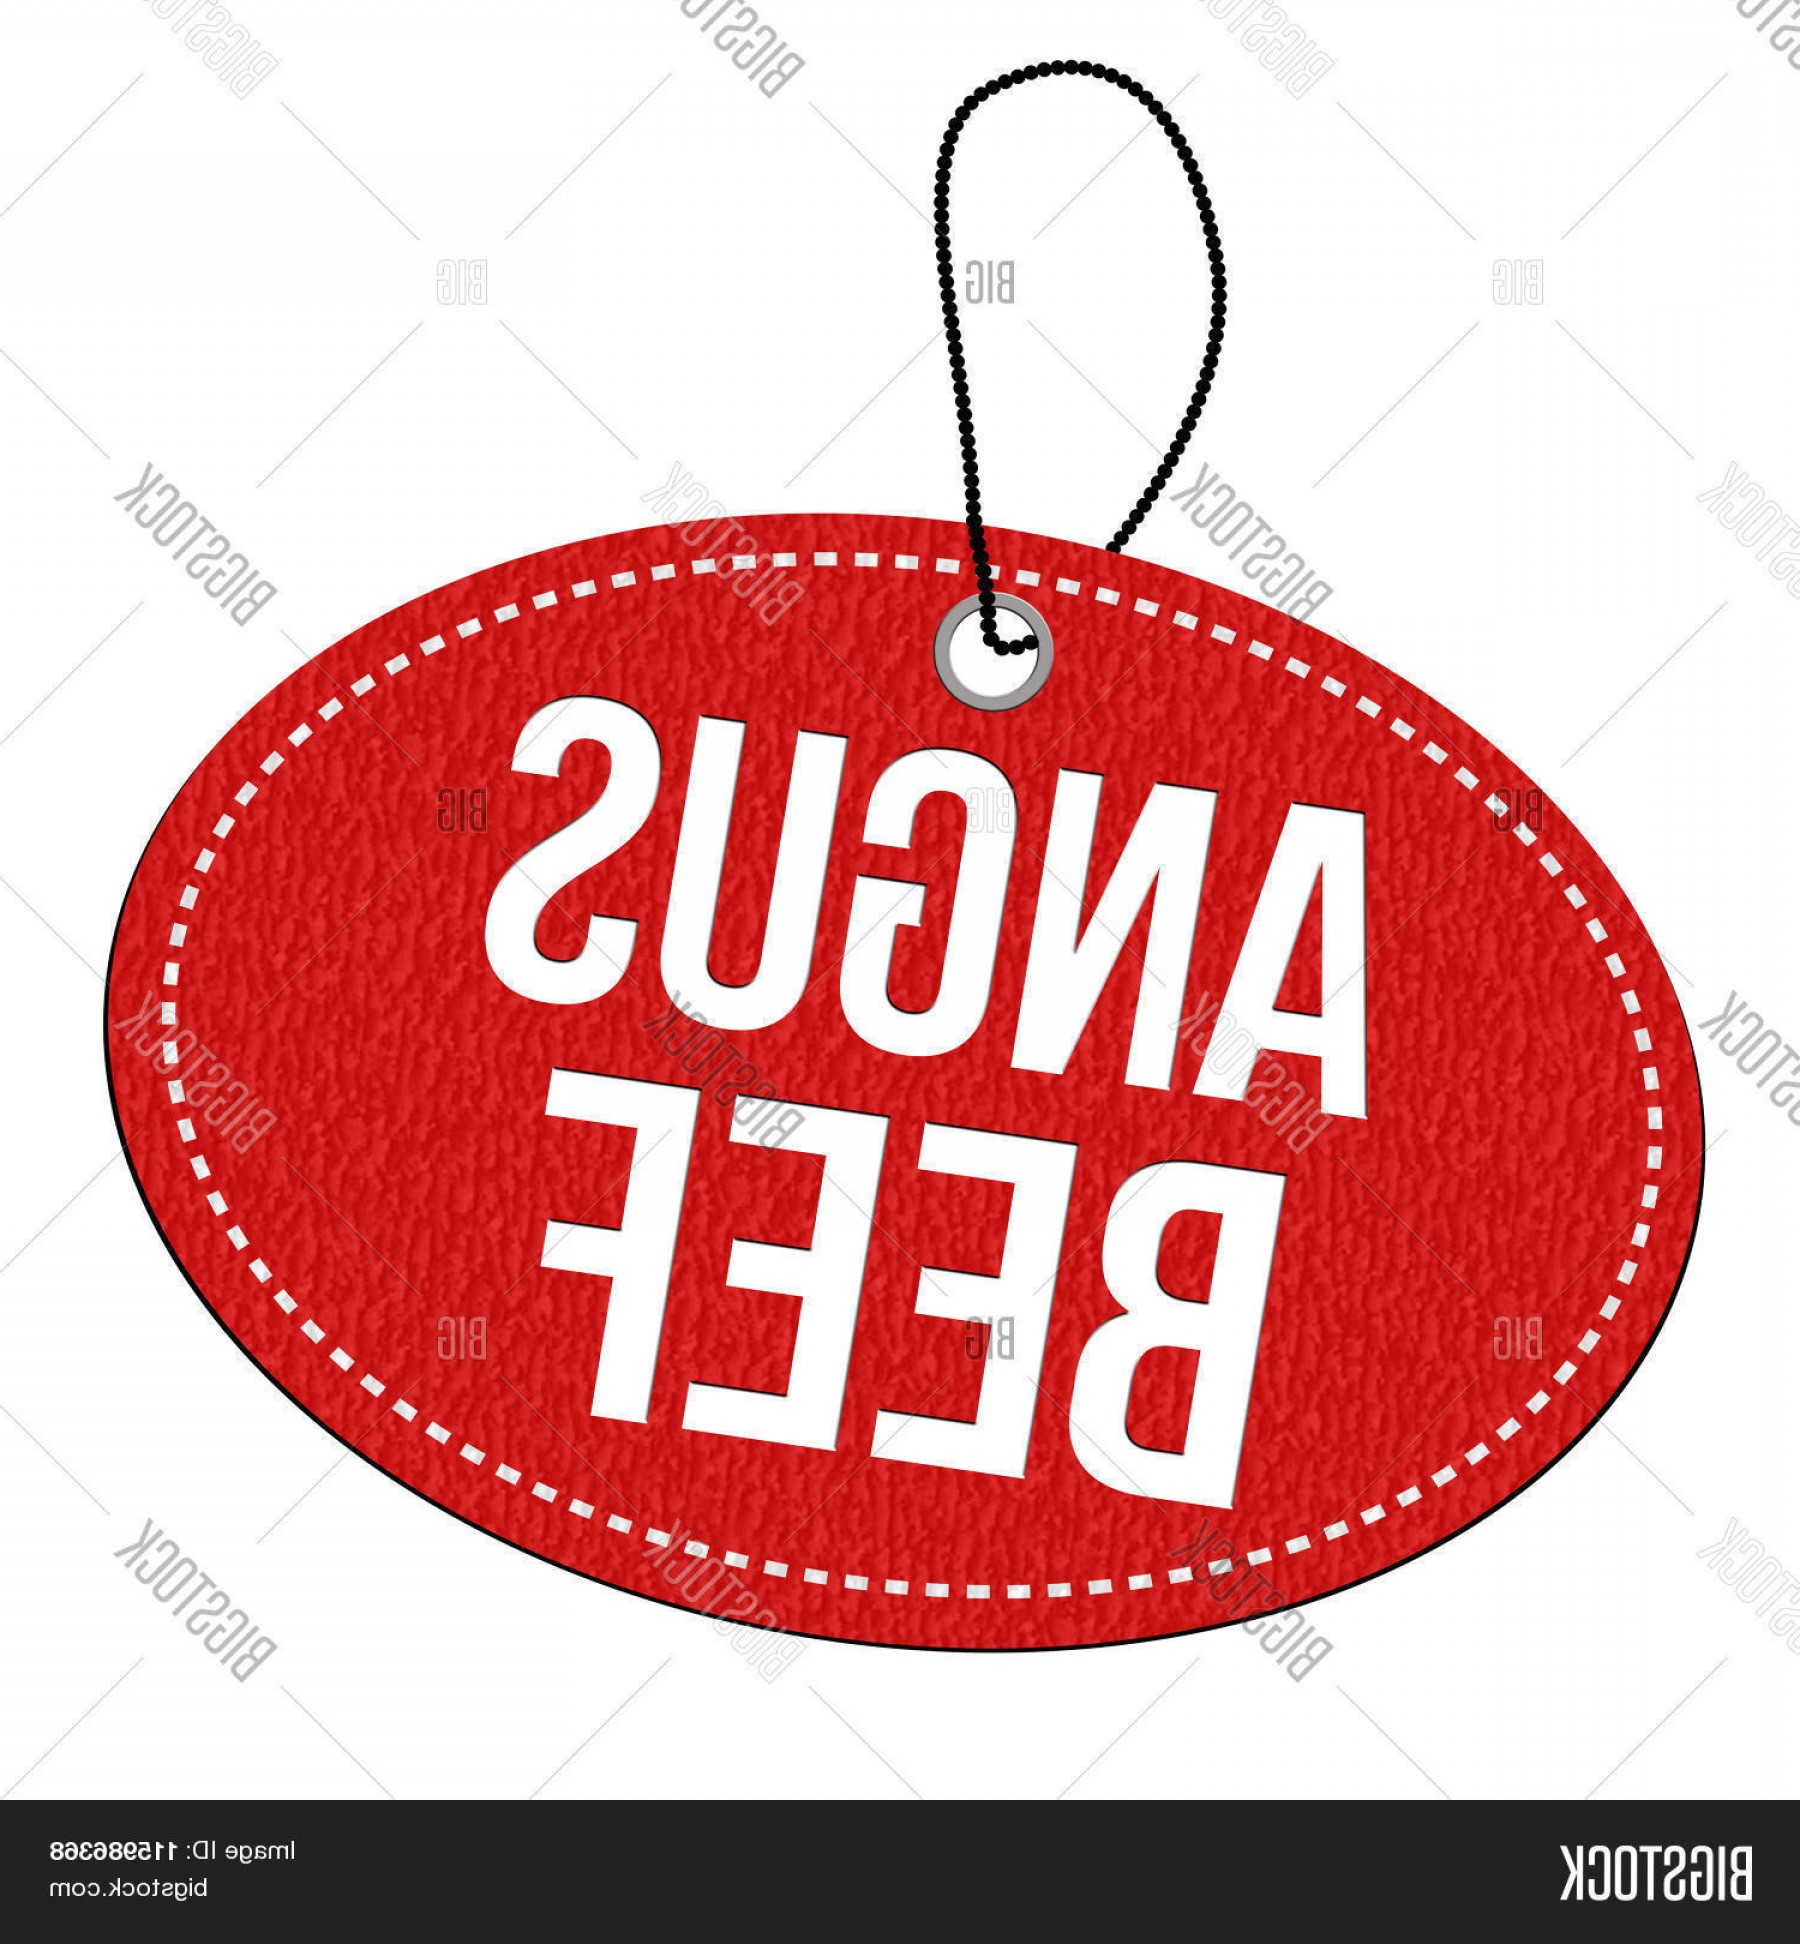 1800x1944 Angus Beef Vector Arenawp